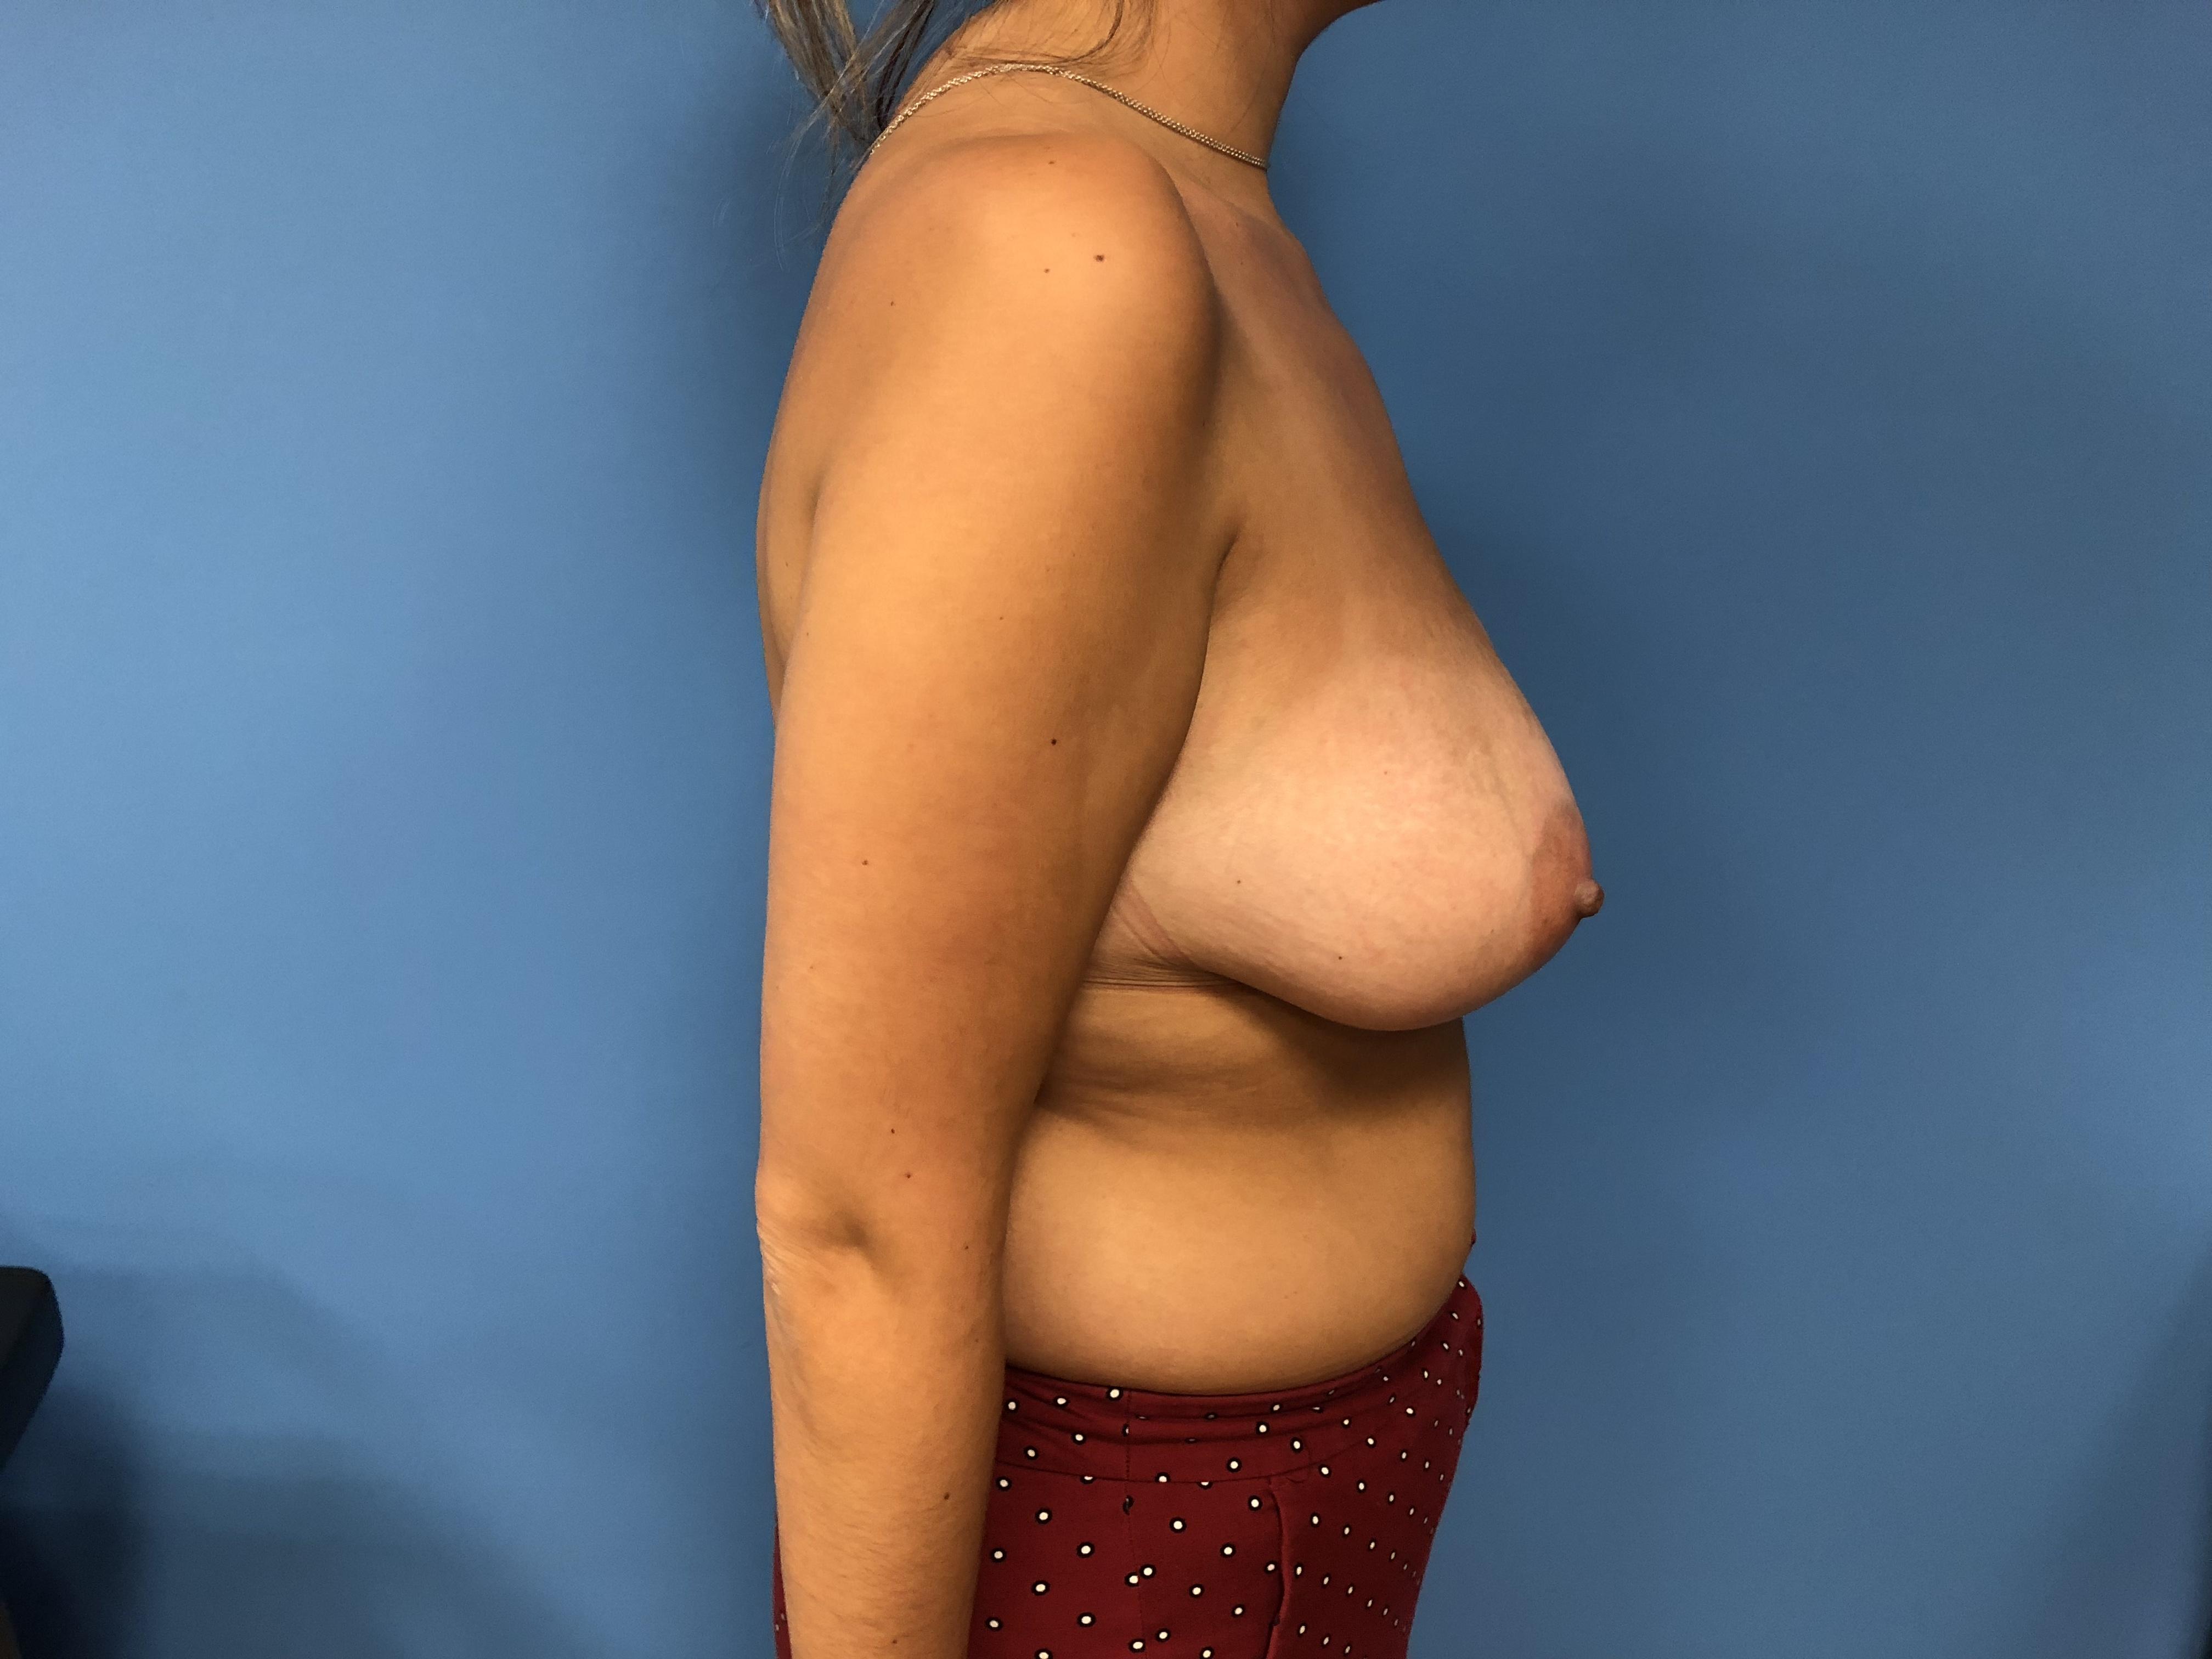 breast-lift-pics-hot-sweedish-girl-fully-nude